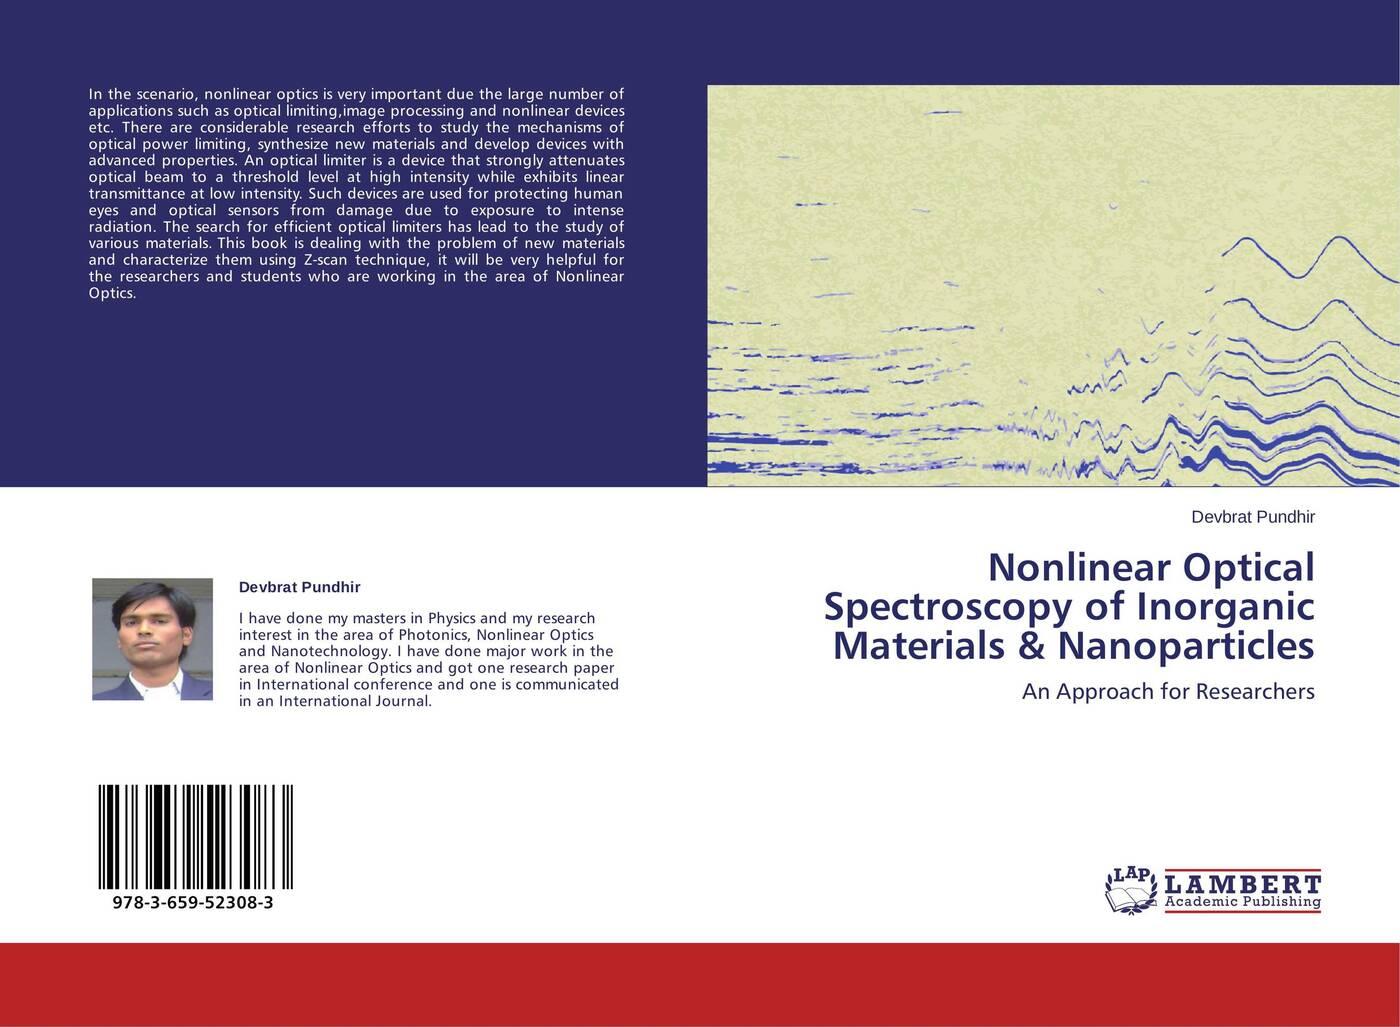 Devbrat Pundhir Nonlinear Optical Spectroscopy of Inorganic Materials & Nanoparticles цена в Москве и Питере